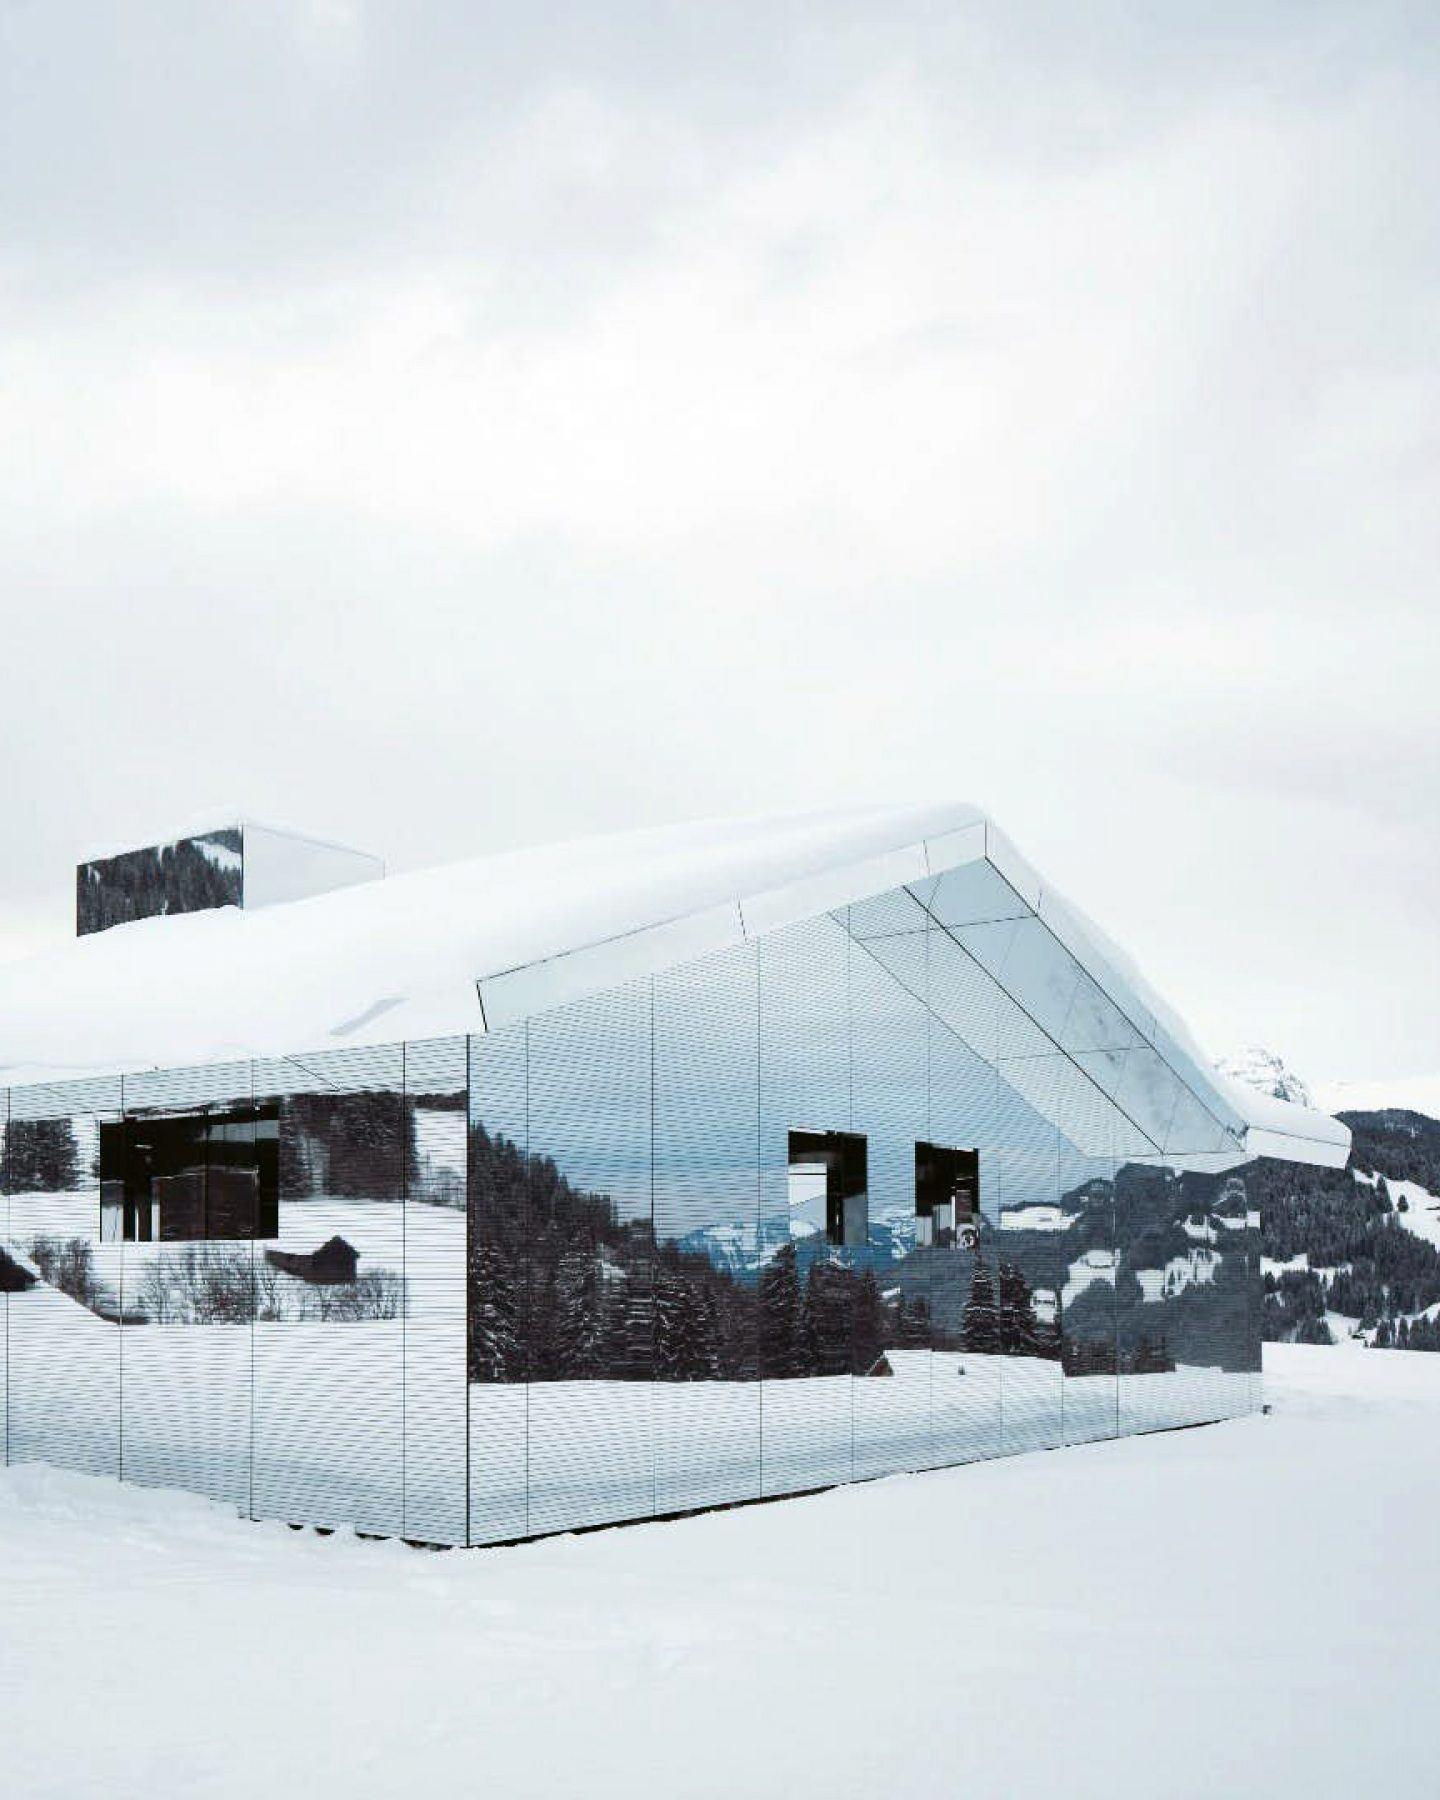 ignant-architecture-doug-aitken-mirage-gstaad-20